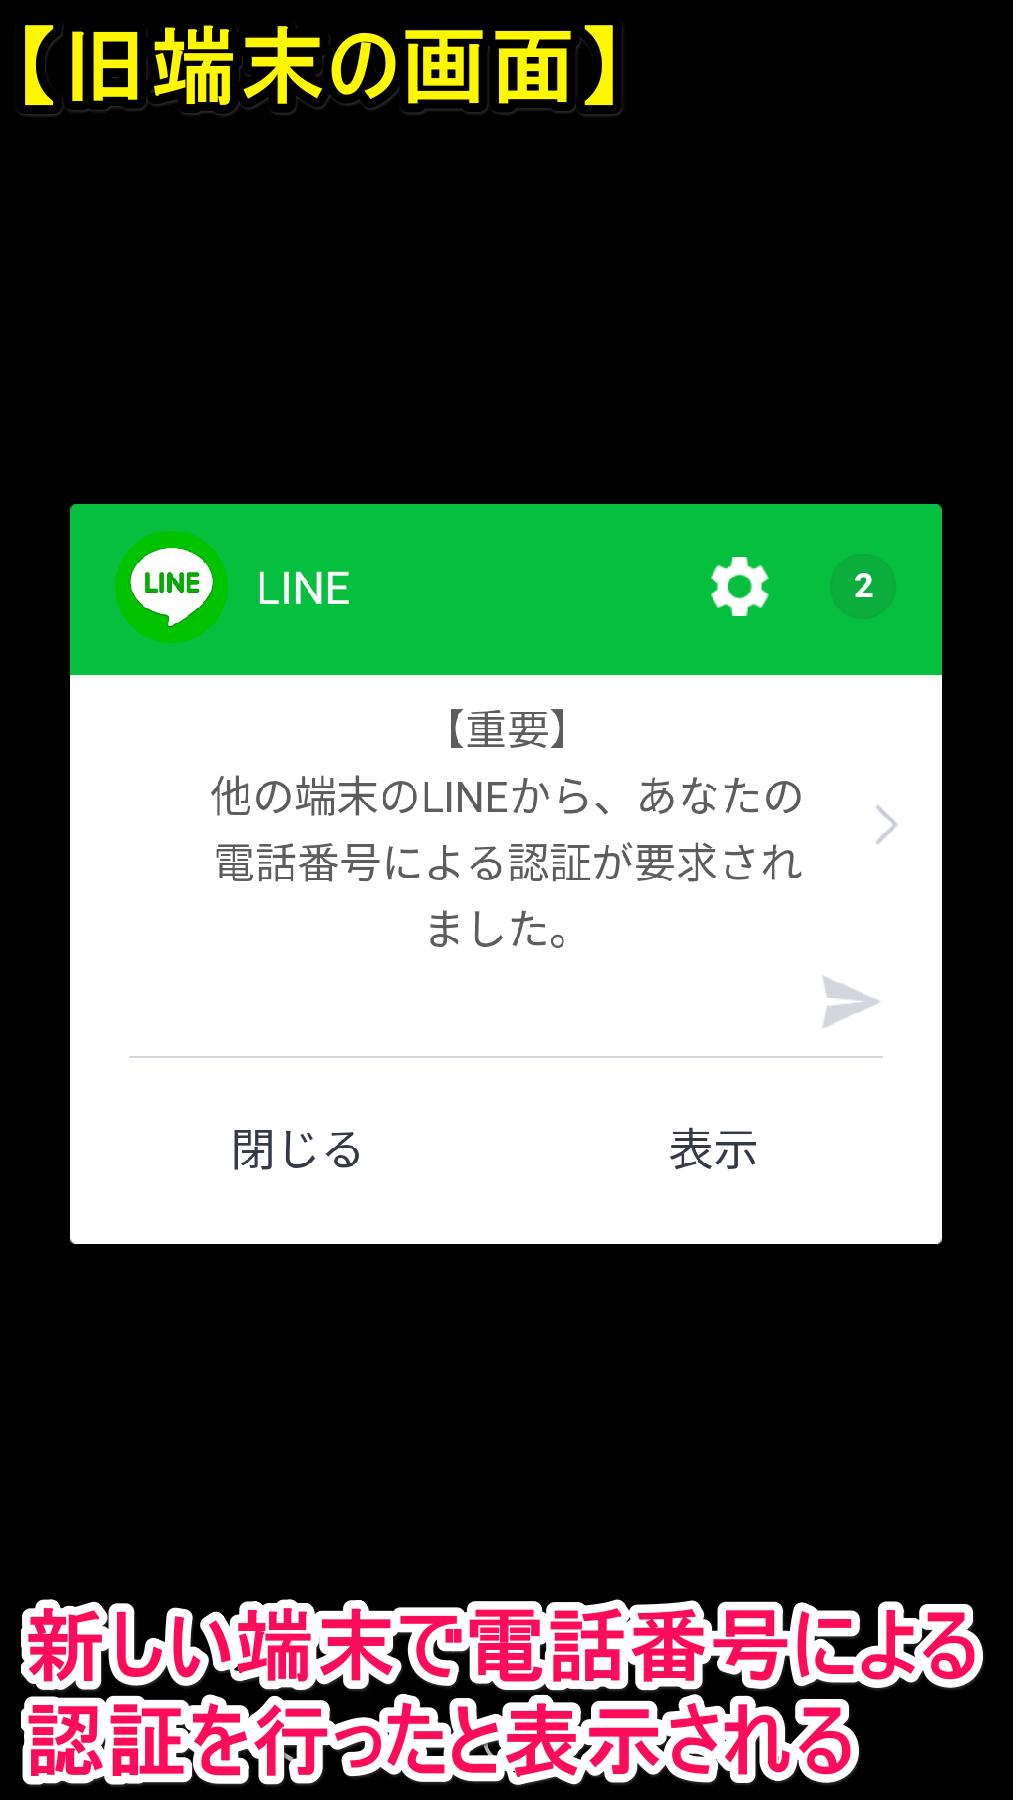 LINE(ライン)の移行元(旧端末)に表示される[【重要】]画面